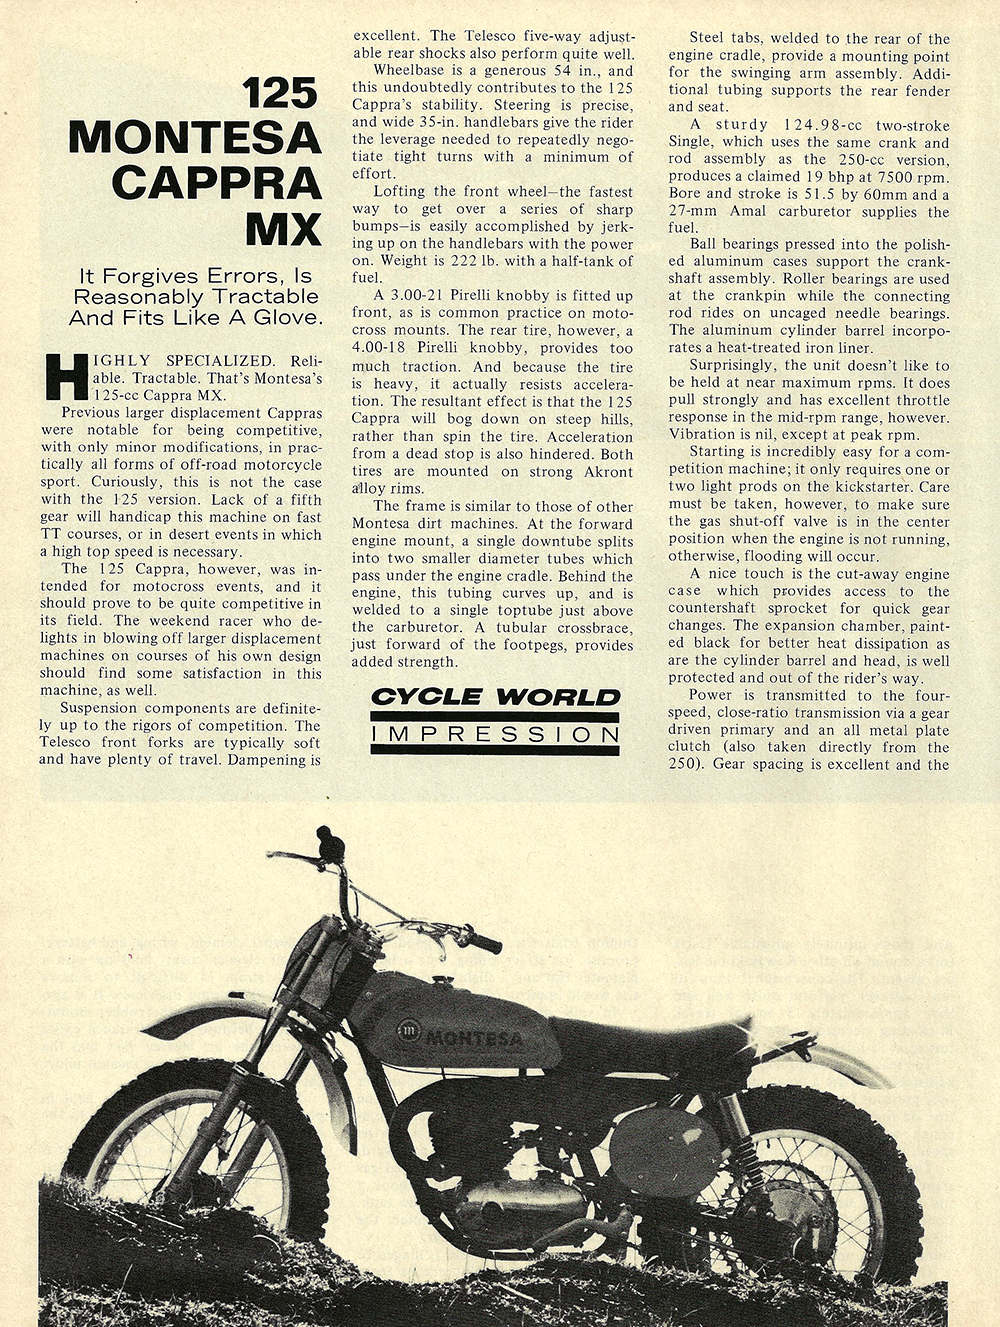 1971 Montesa Cappra 125 MX impression 01.jpg